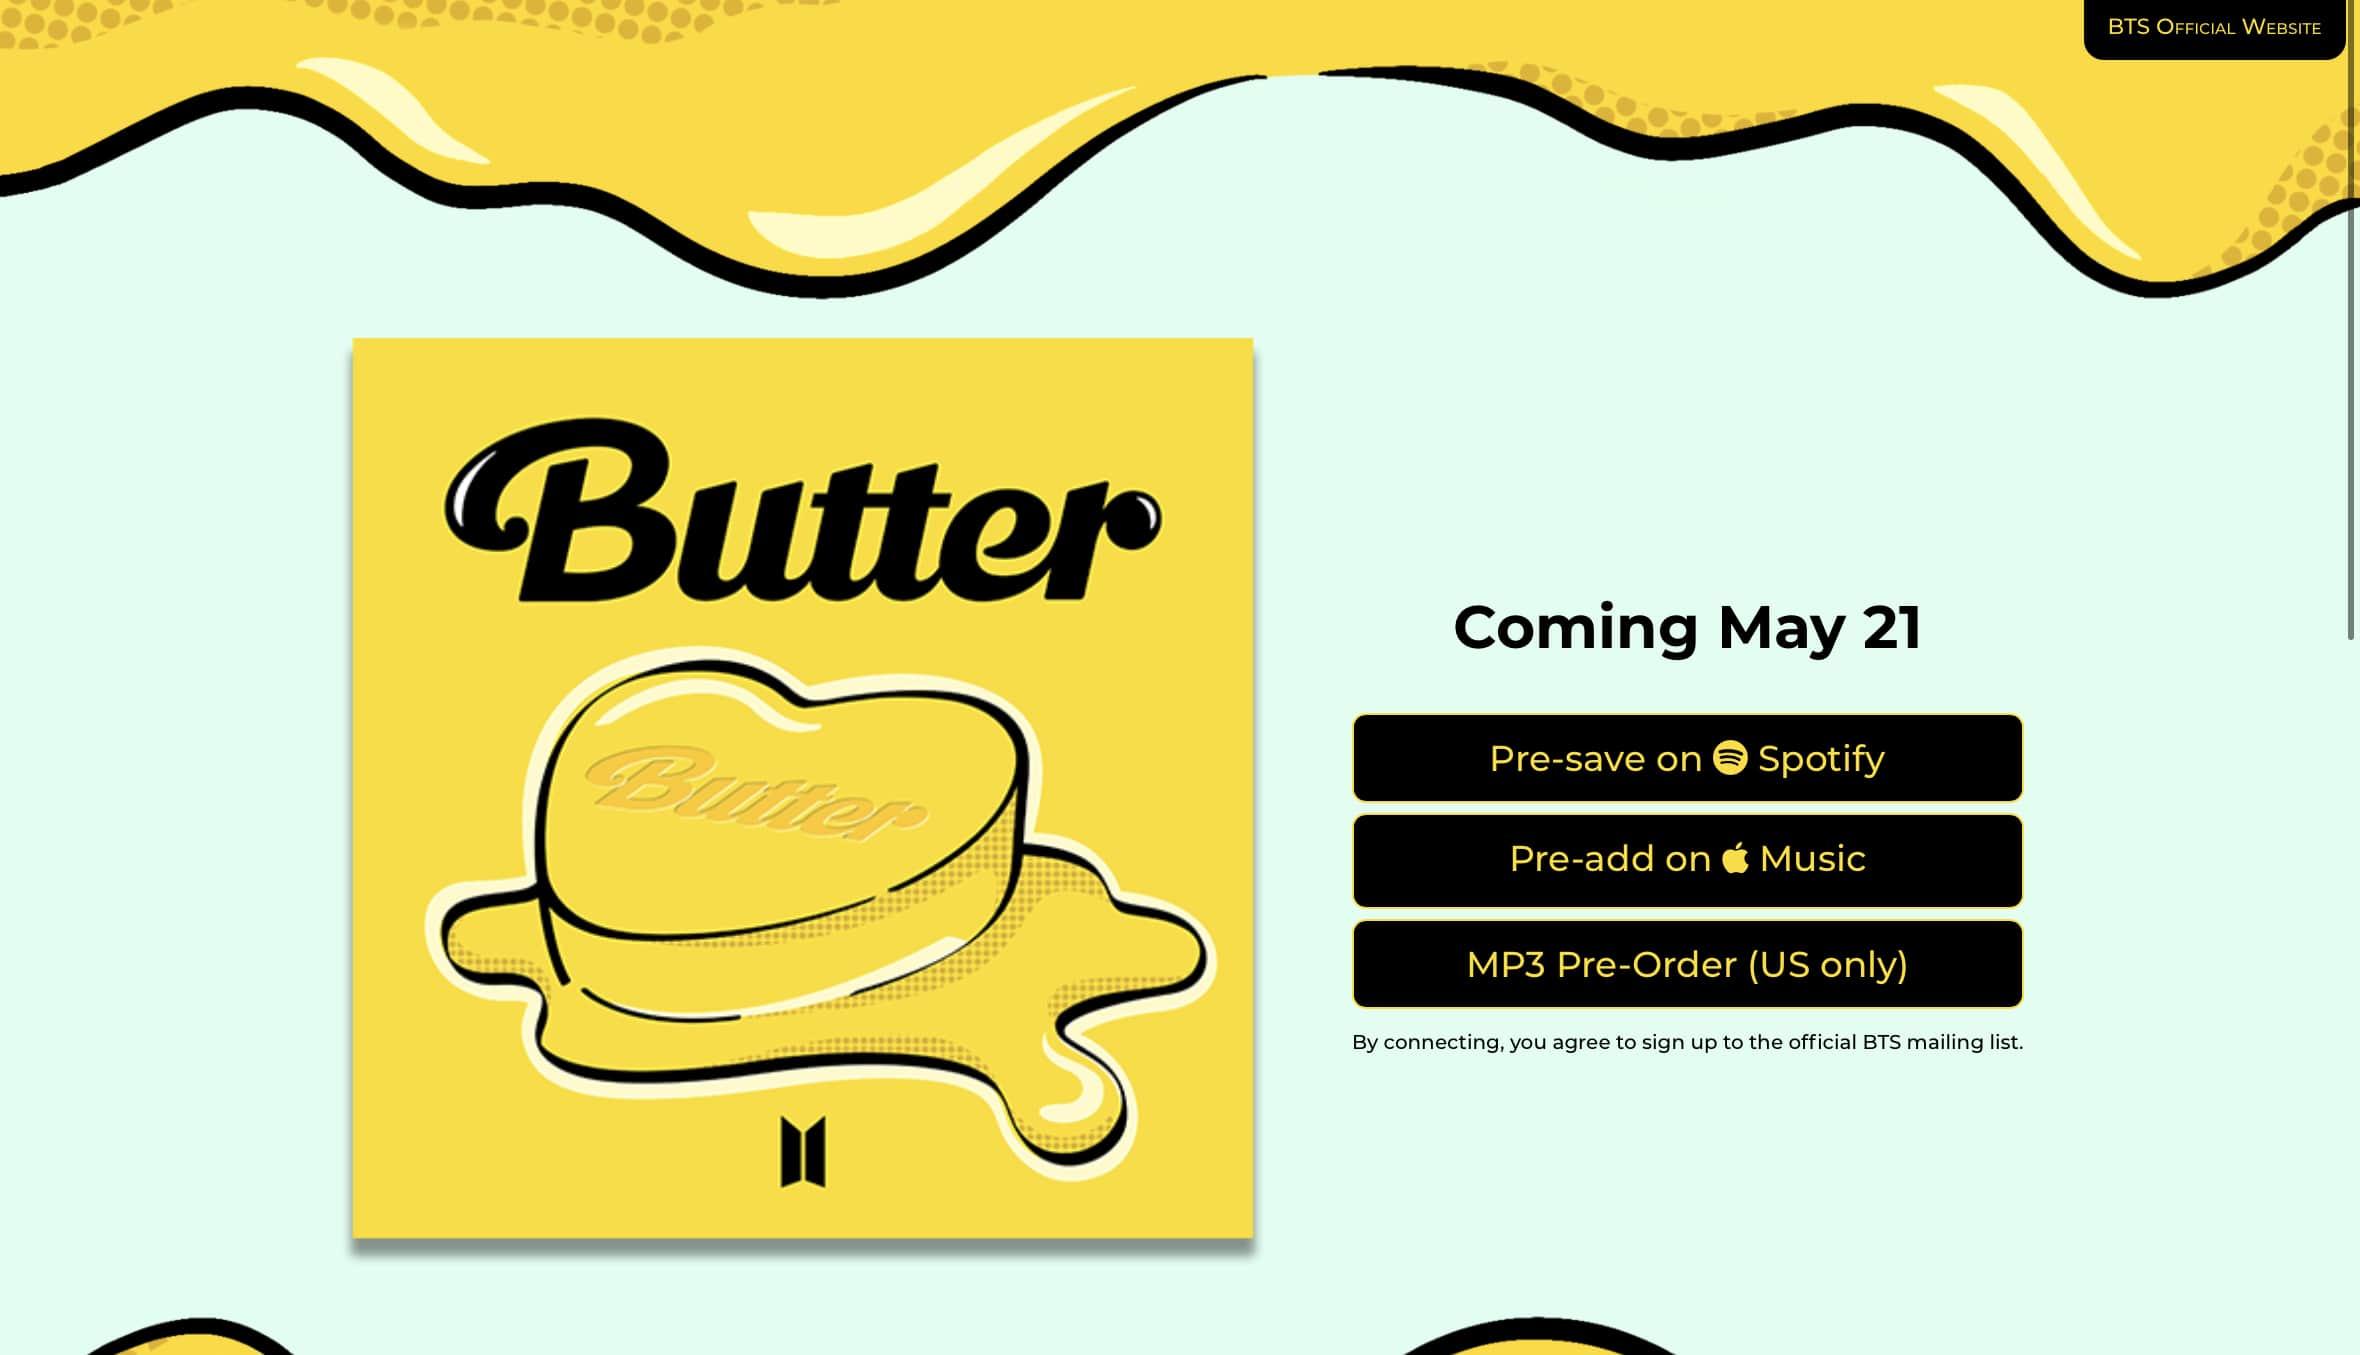 Cara Membuat BTS Butter Nama Sendiri